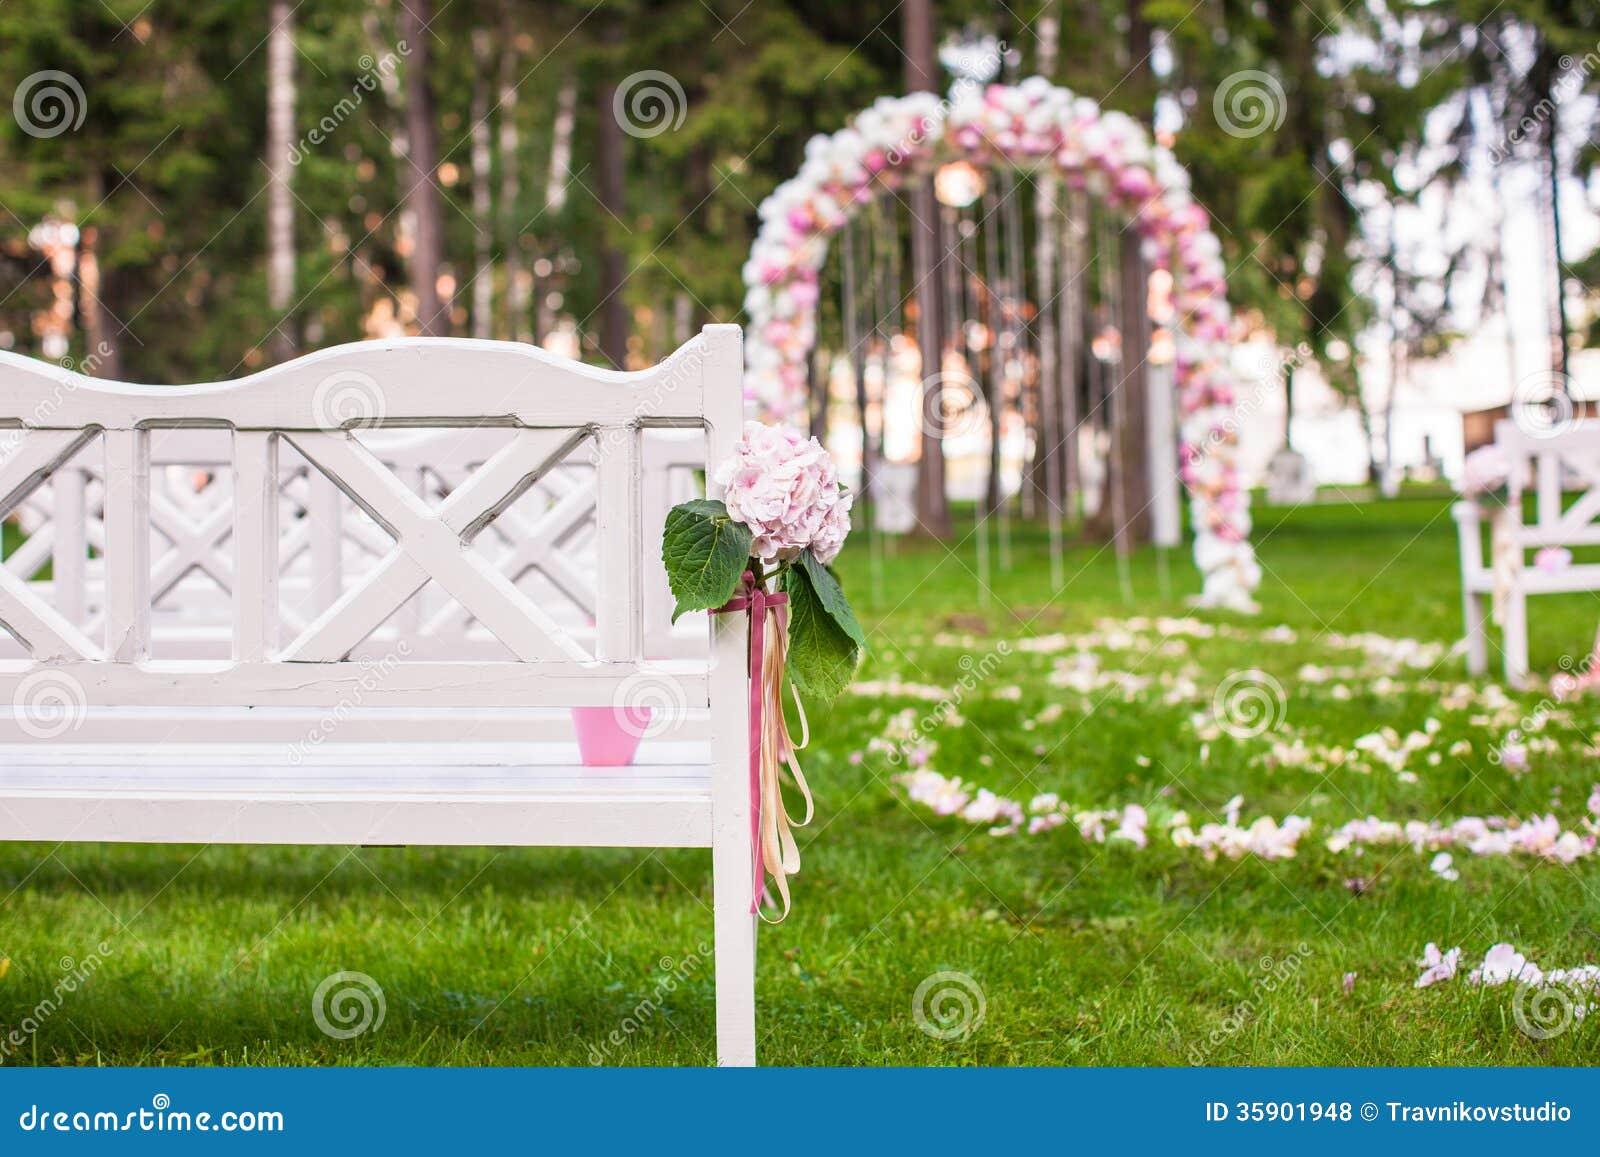 Wedding Ceremony Ideas Flower Covered Wedding Arch: Wedding Benches And Flower Arch For Ceremony Stock Photo